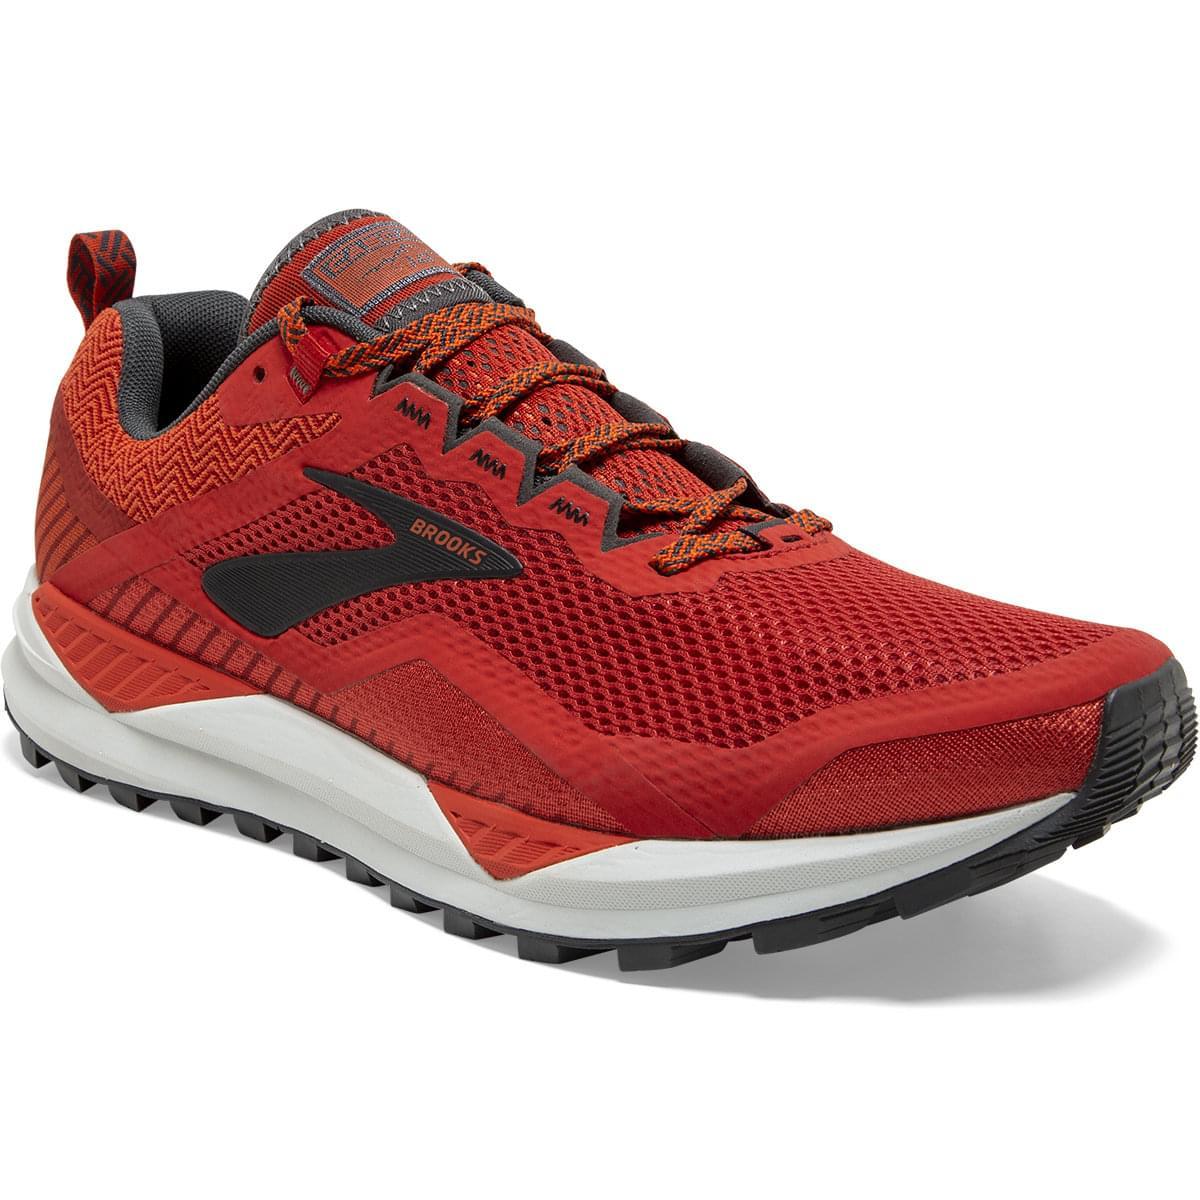 Chaussures de Trail Brooks Cascadia 14 (2020) - Red/Ebony/Grey, du 40 au 47 1/2